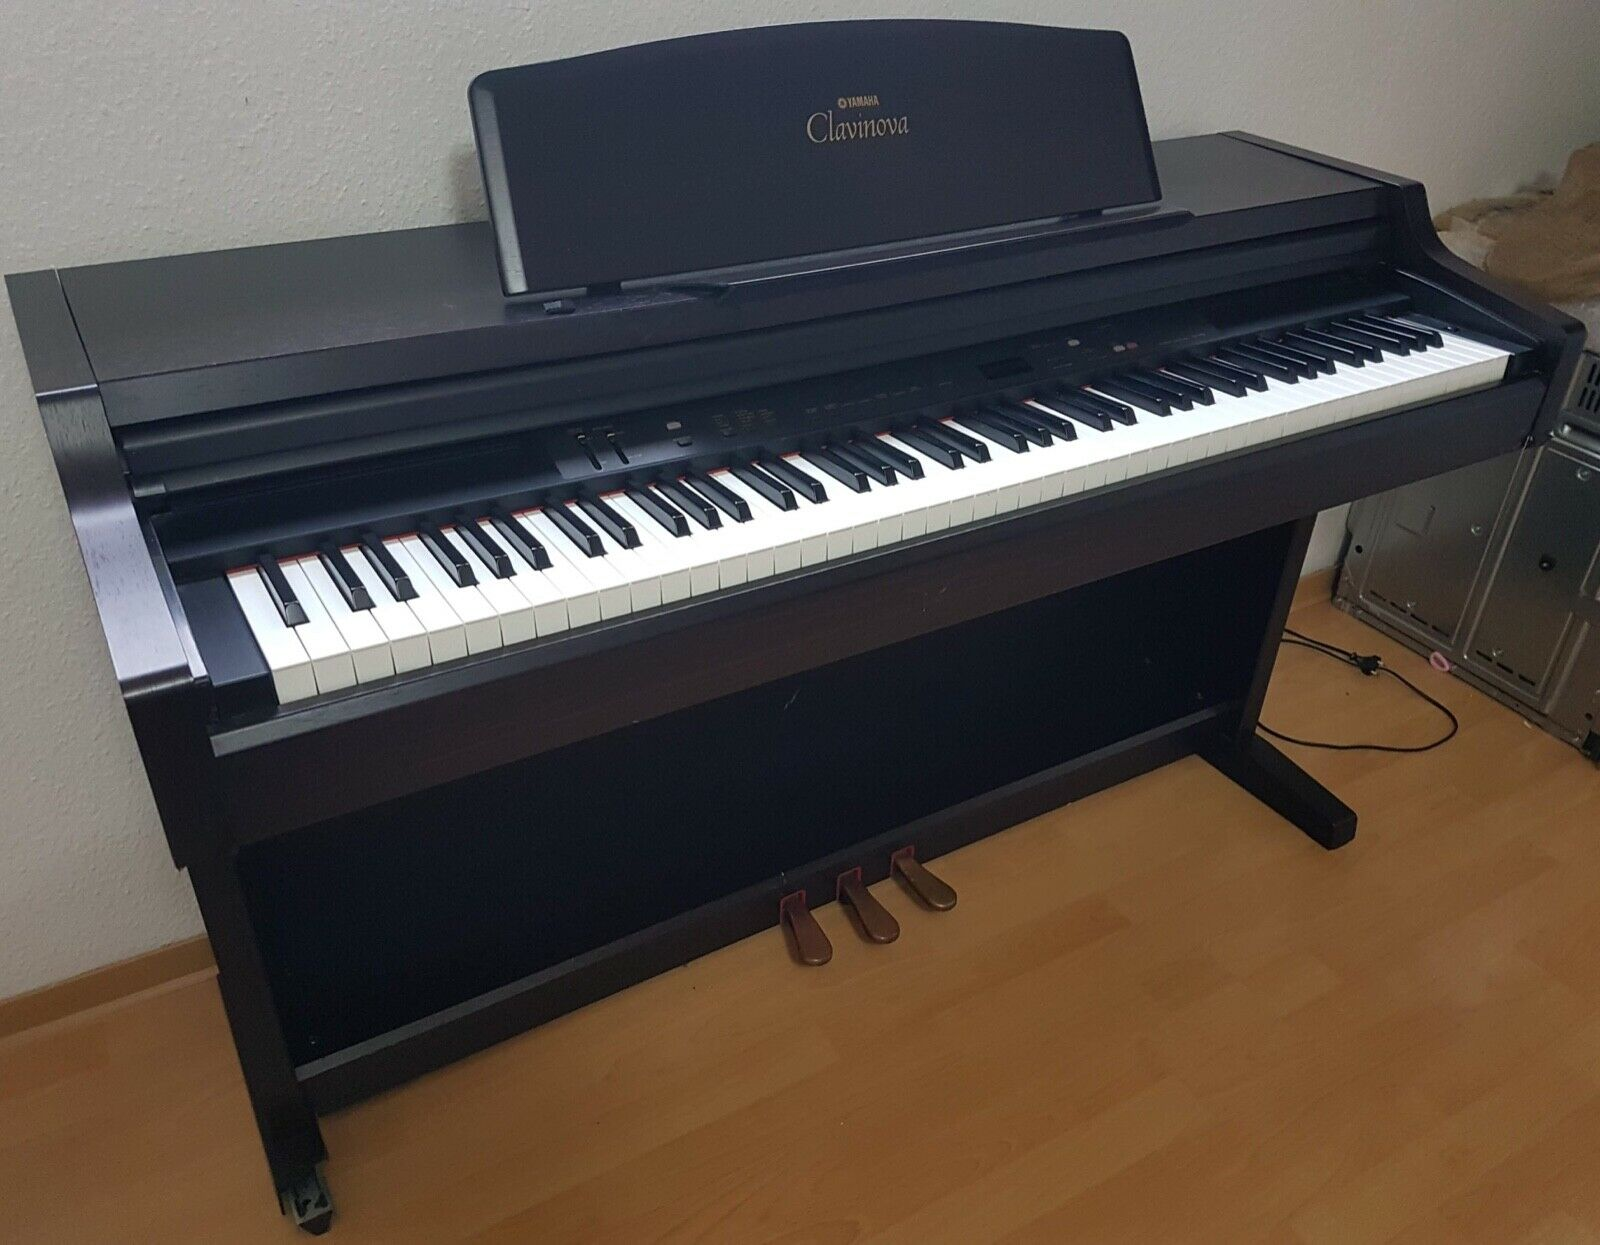 Yamaha Clavinova clp-840 Klavier Piano Digital